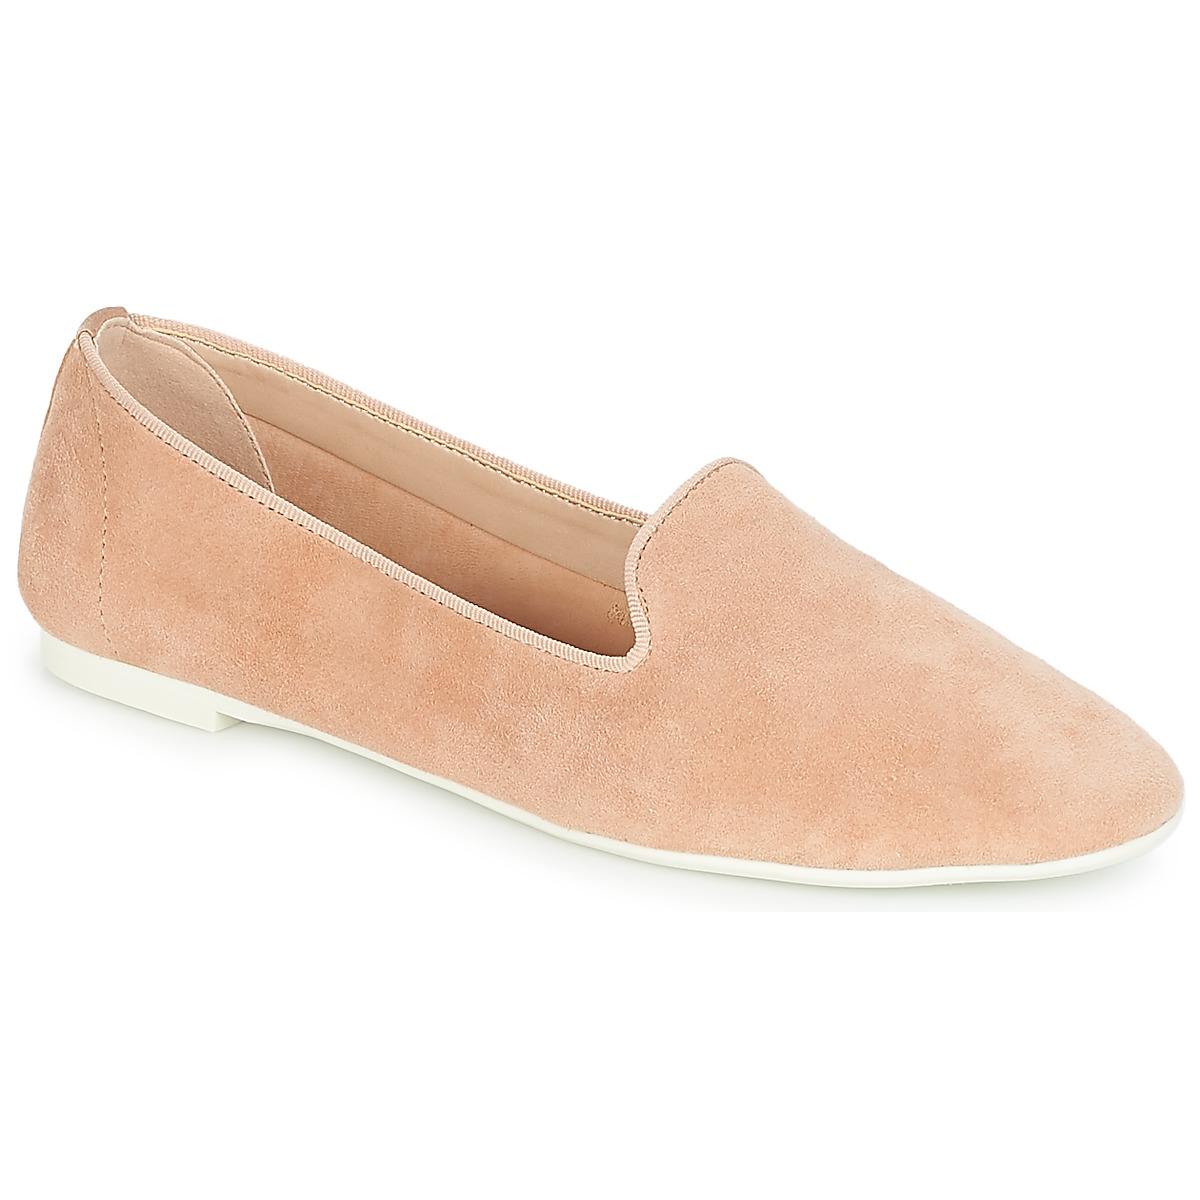 Buffalo YOYOLO Rose - Kostenloser Versand bei Spartoode ! - Schuhe Slipper Damen 55,90 €